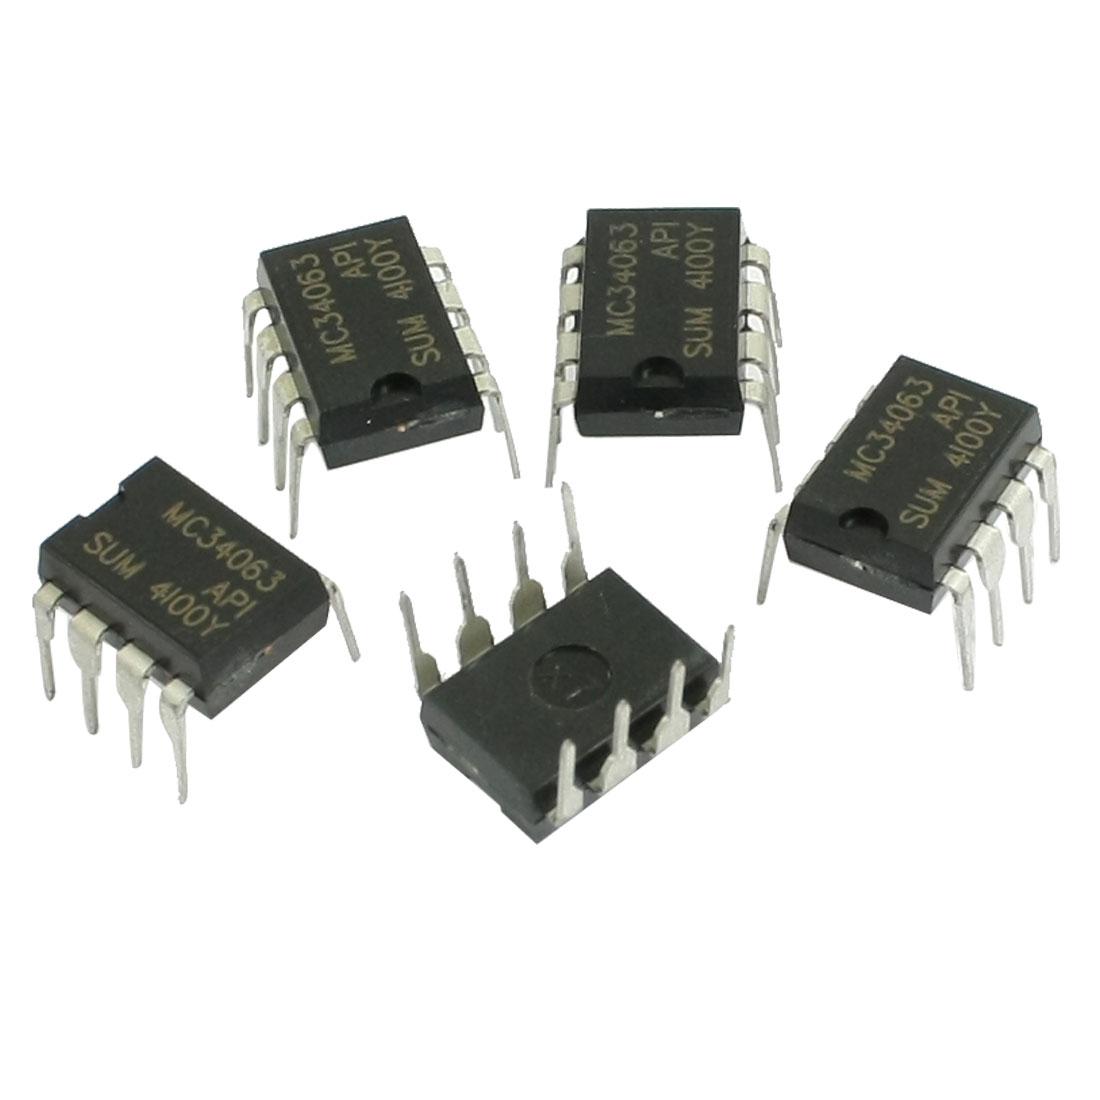 5 Pcs MC34063 DC to DC Converter Control Circuit 3.0-40V Output Current 1.5A DIP-8